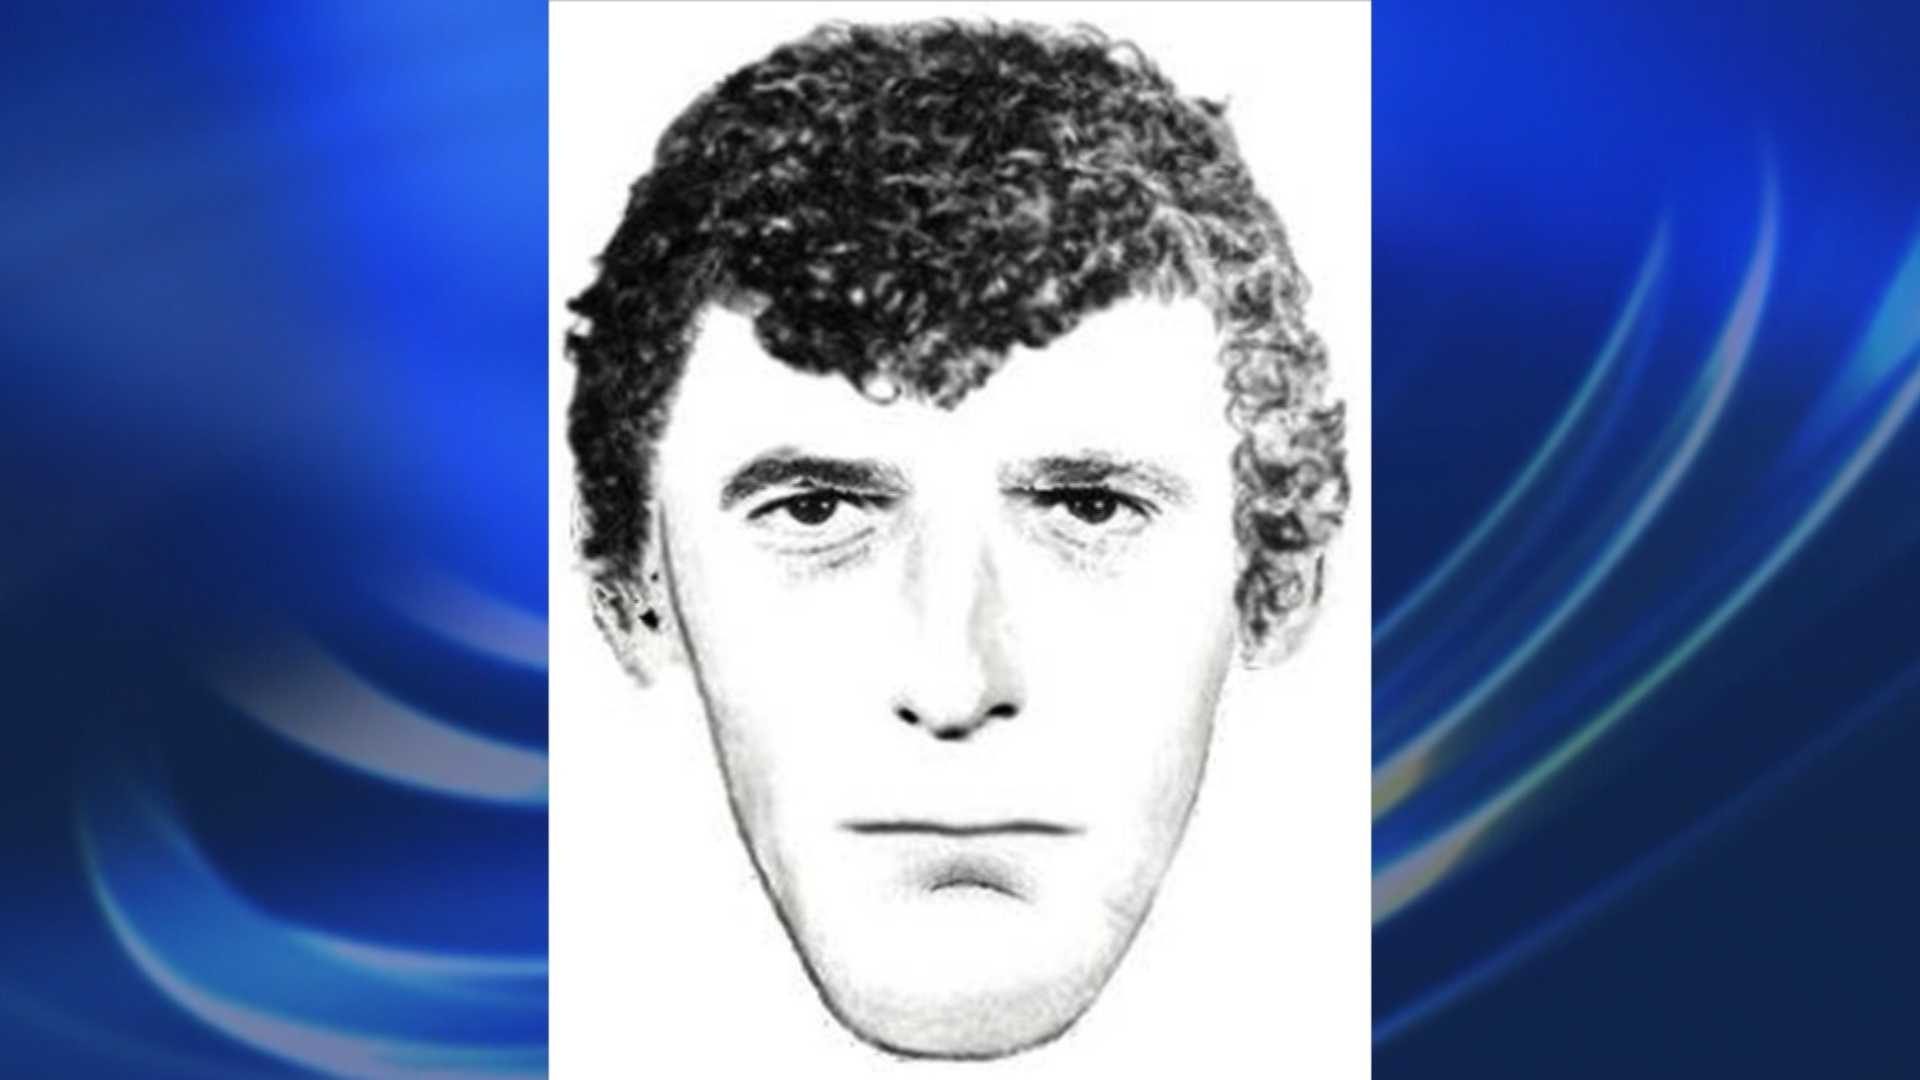 091912 Investigators release sketch of sexual assault suspect - img